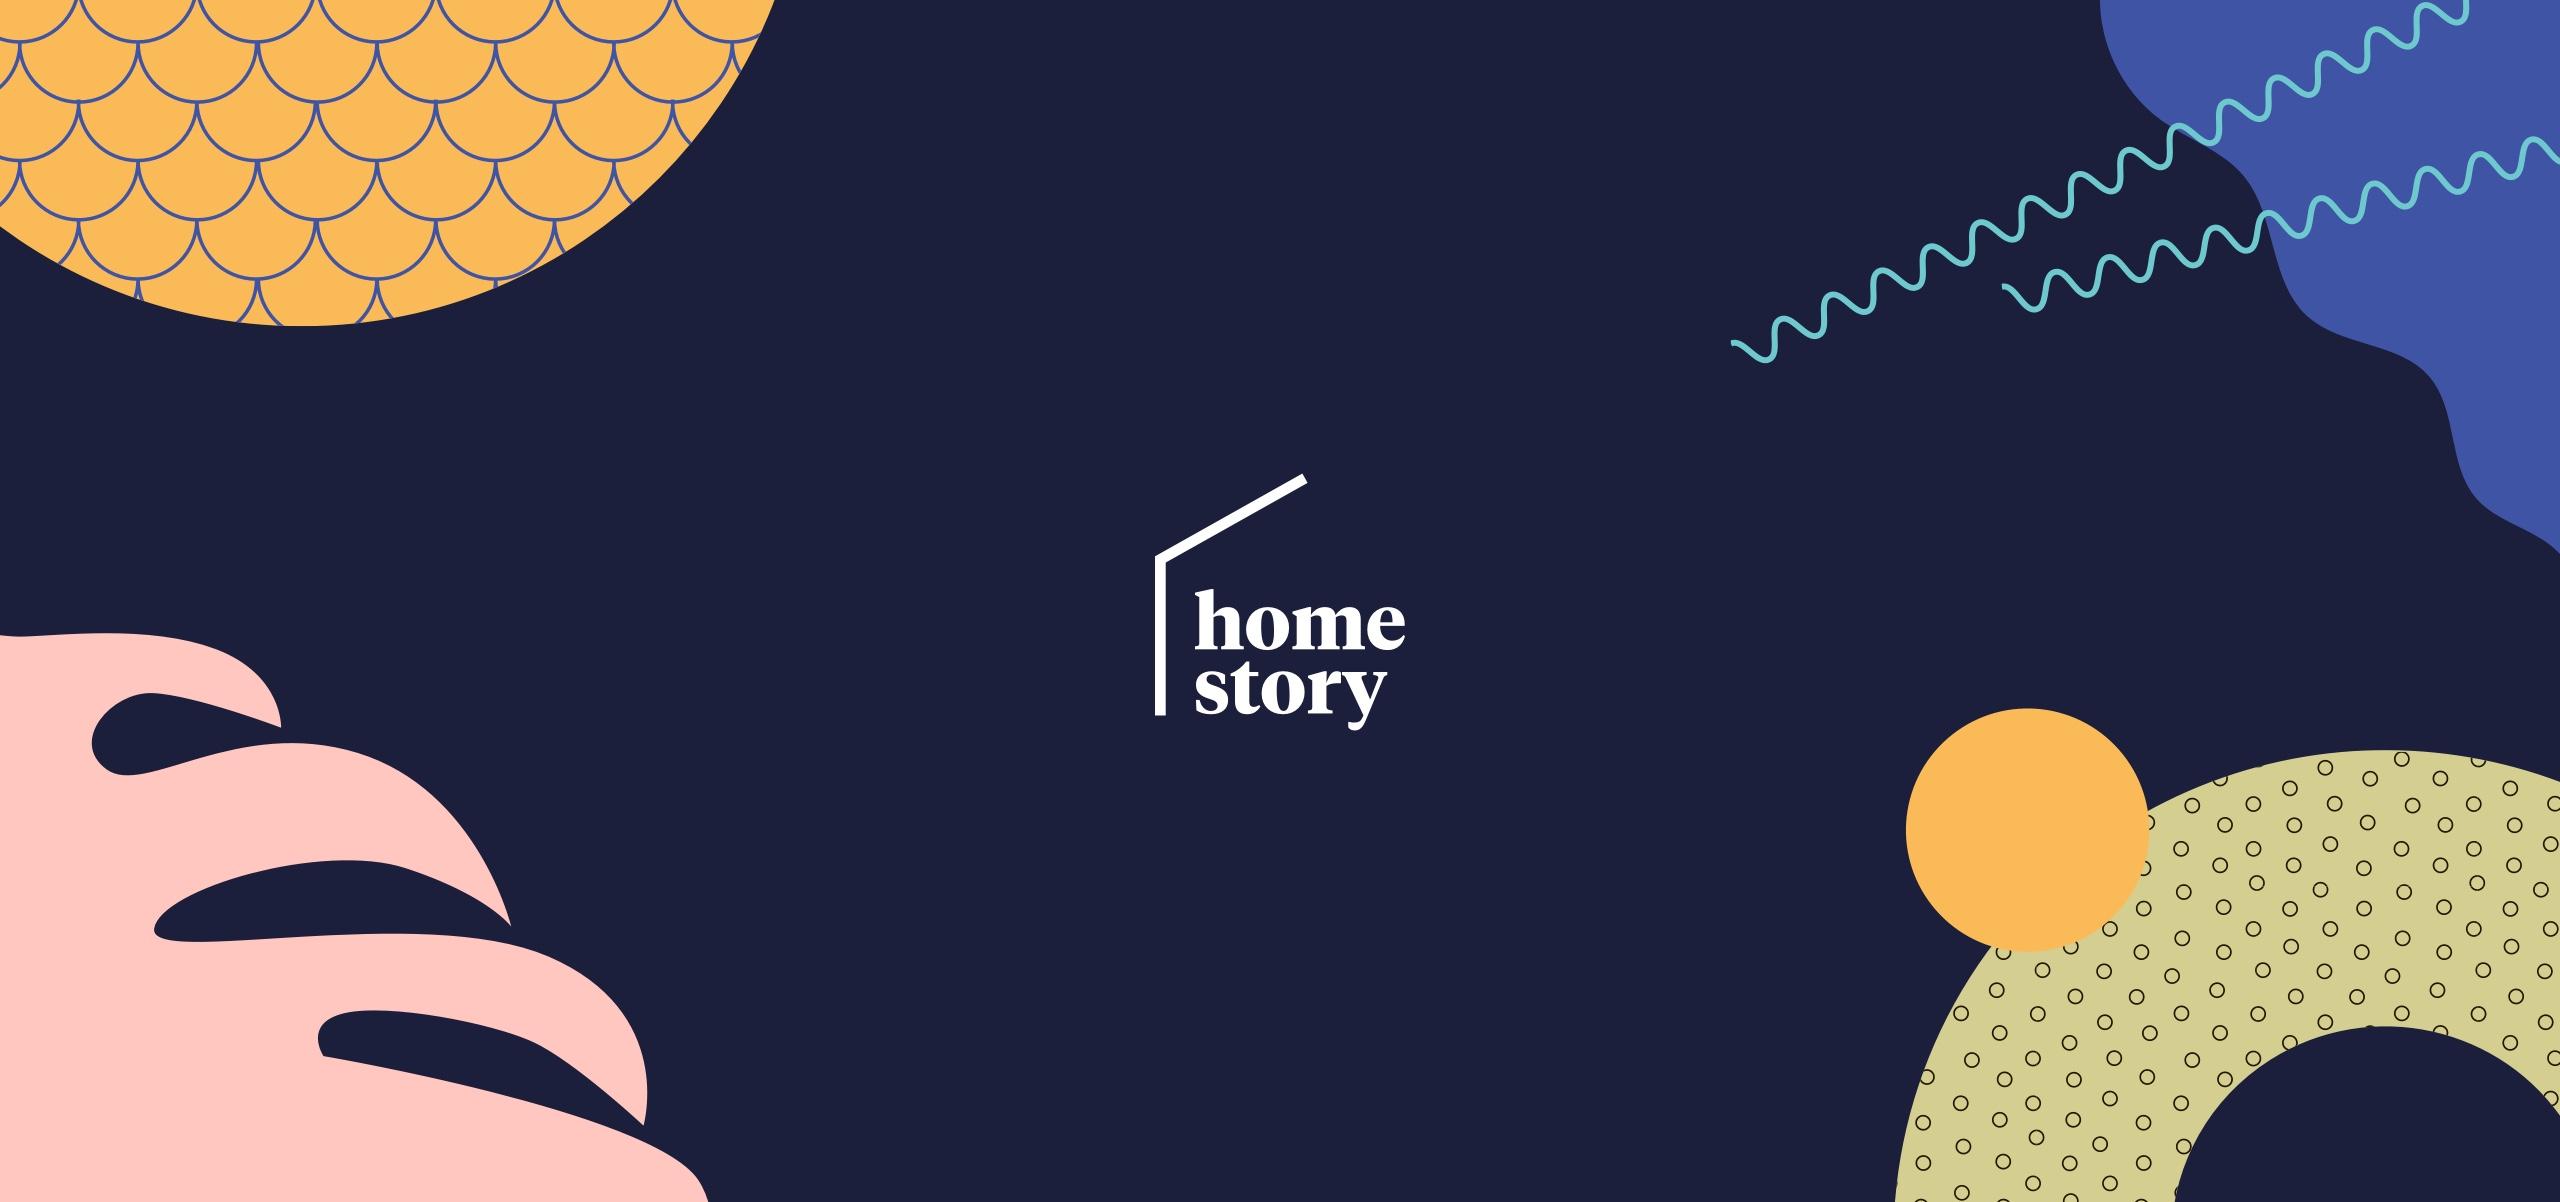 homestory-image-1